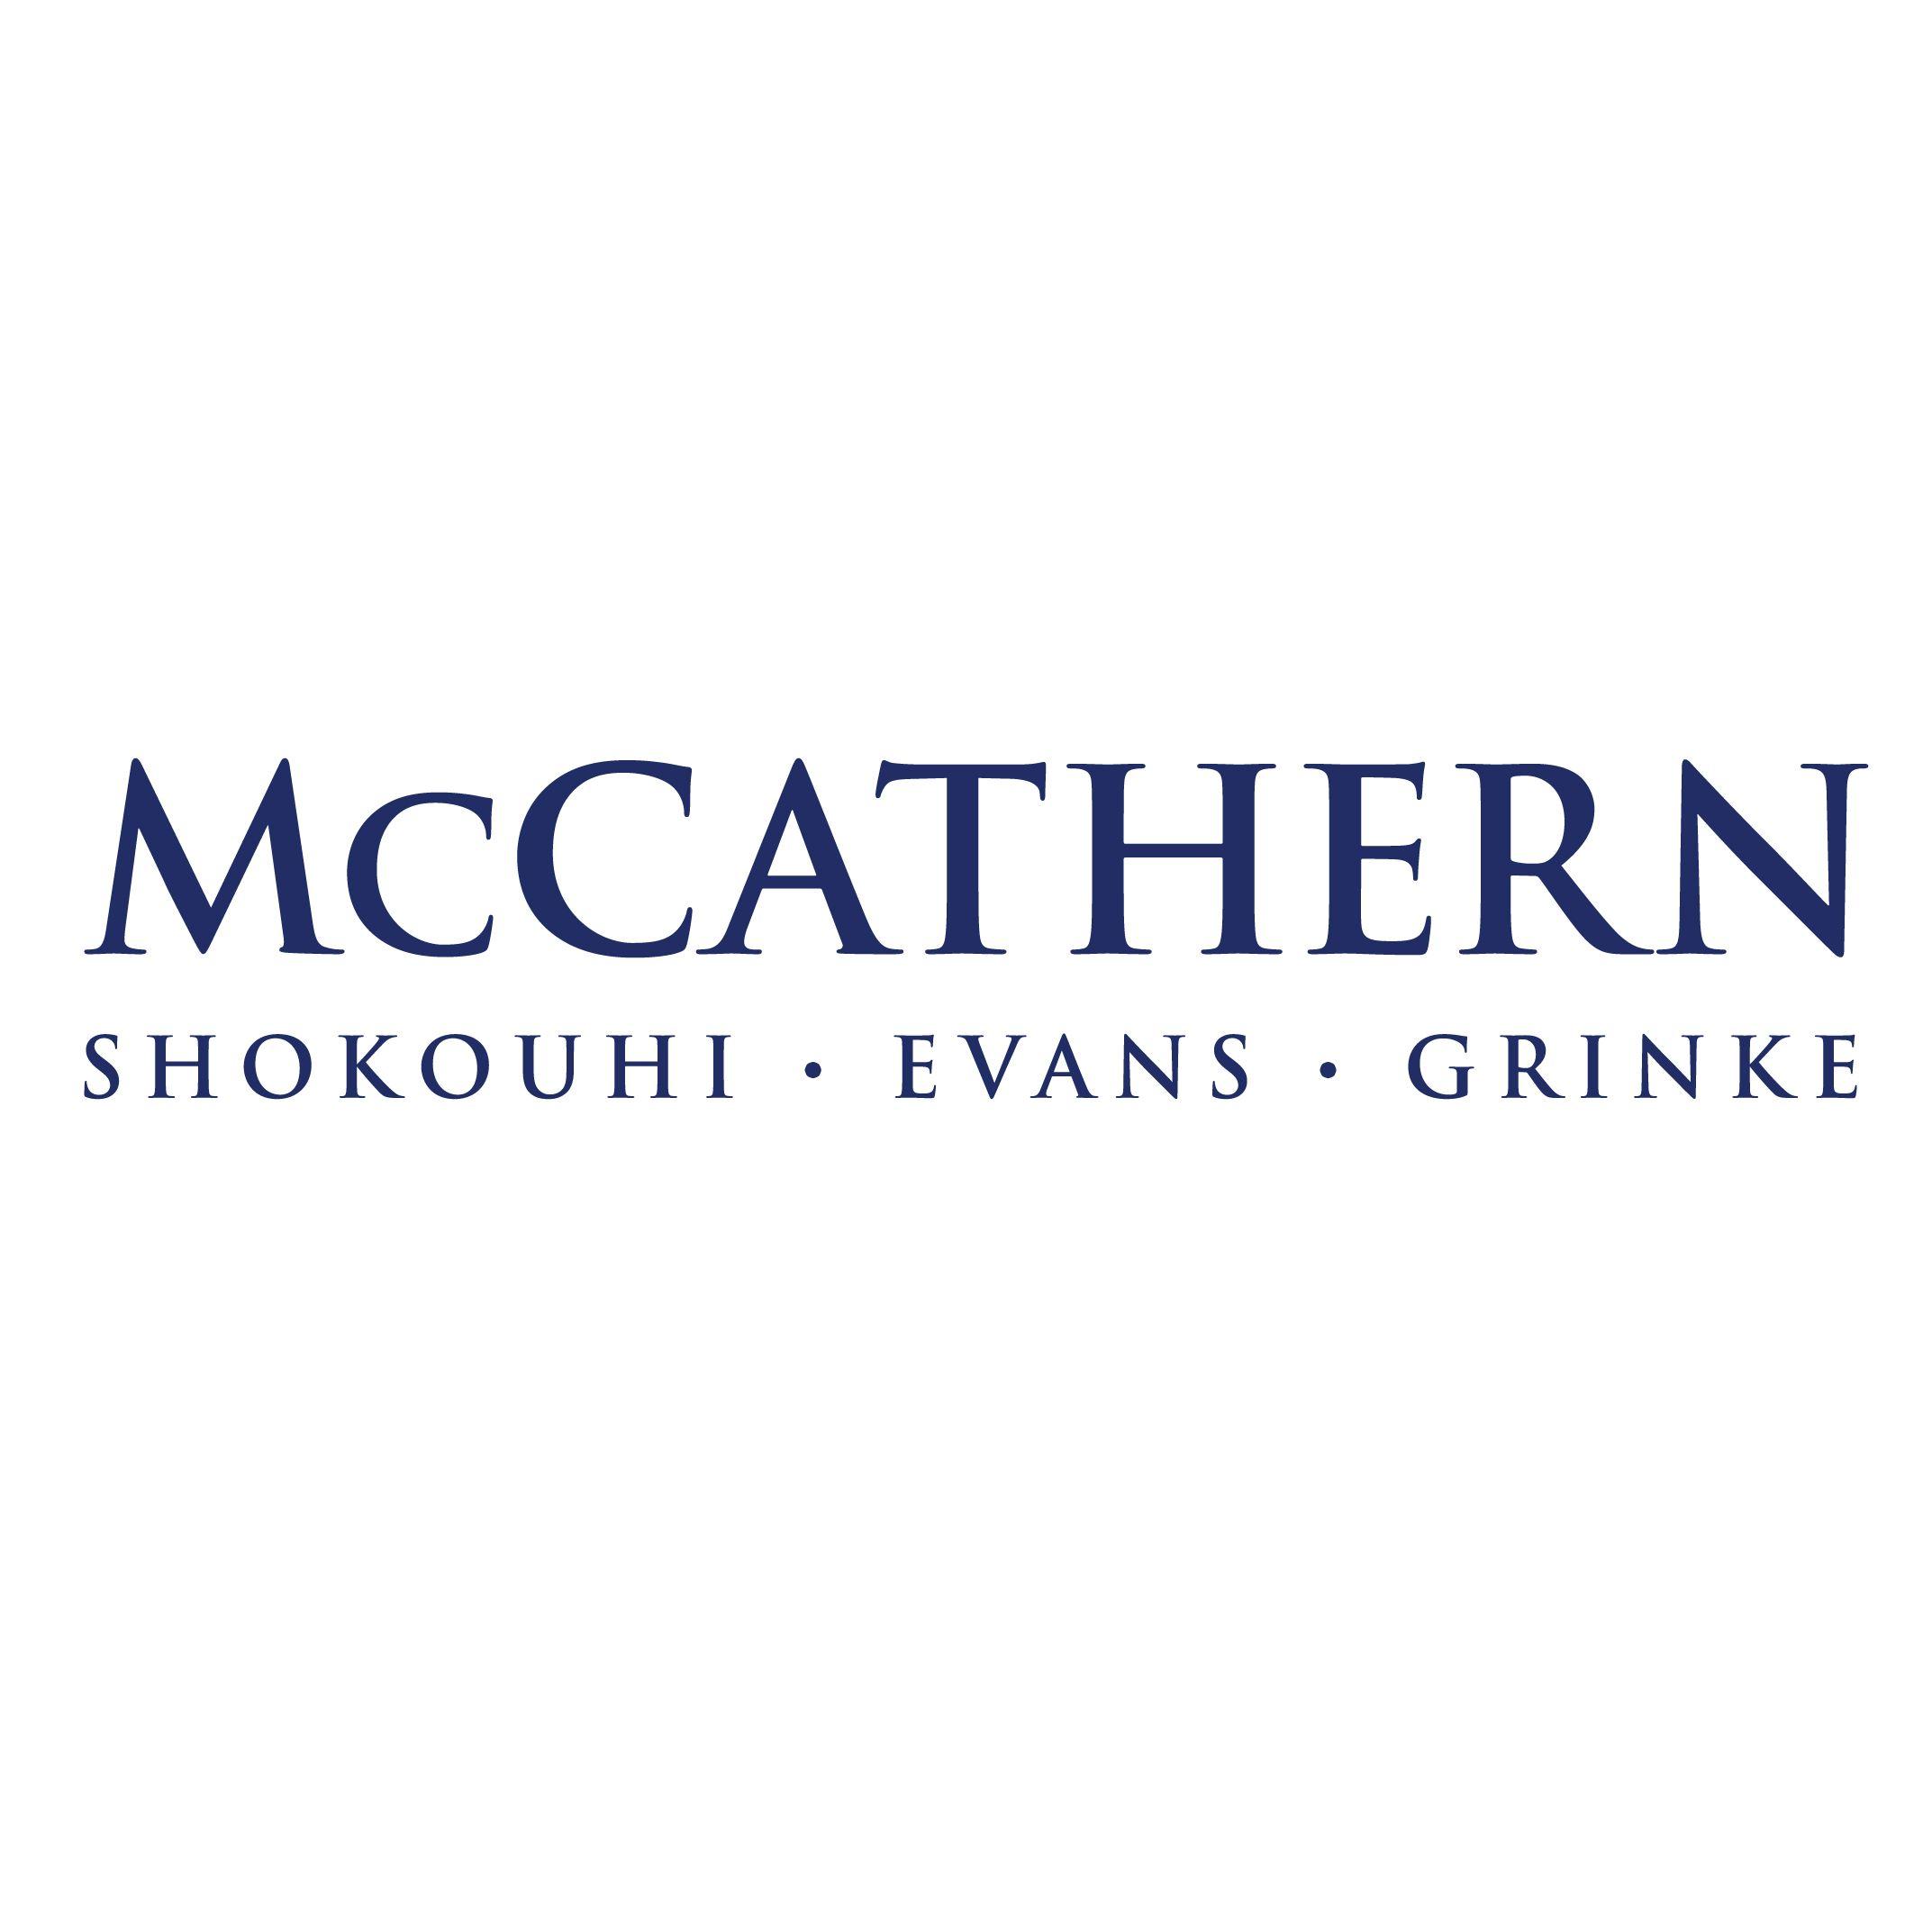 McCathern, Shokouhi, Evans, Grinke, PLLC law firm logo